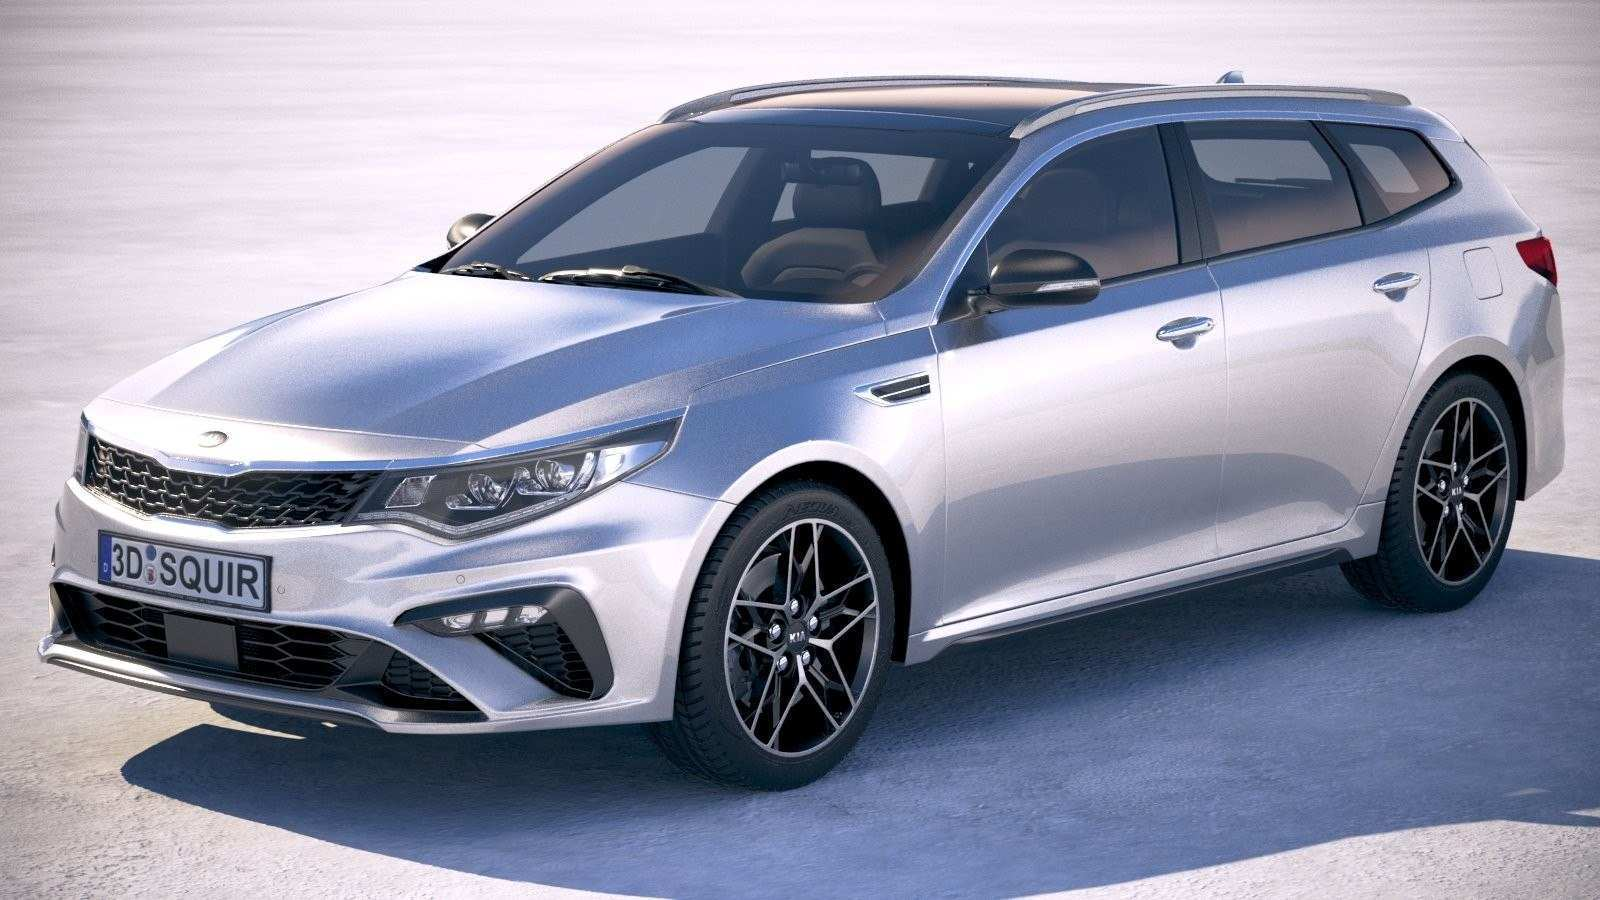 92 Great Kia Wagon 2019 Price Rumors with Kia Wagon 2019 Price